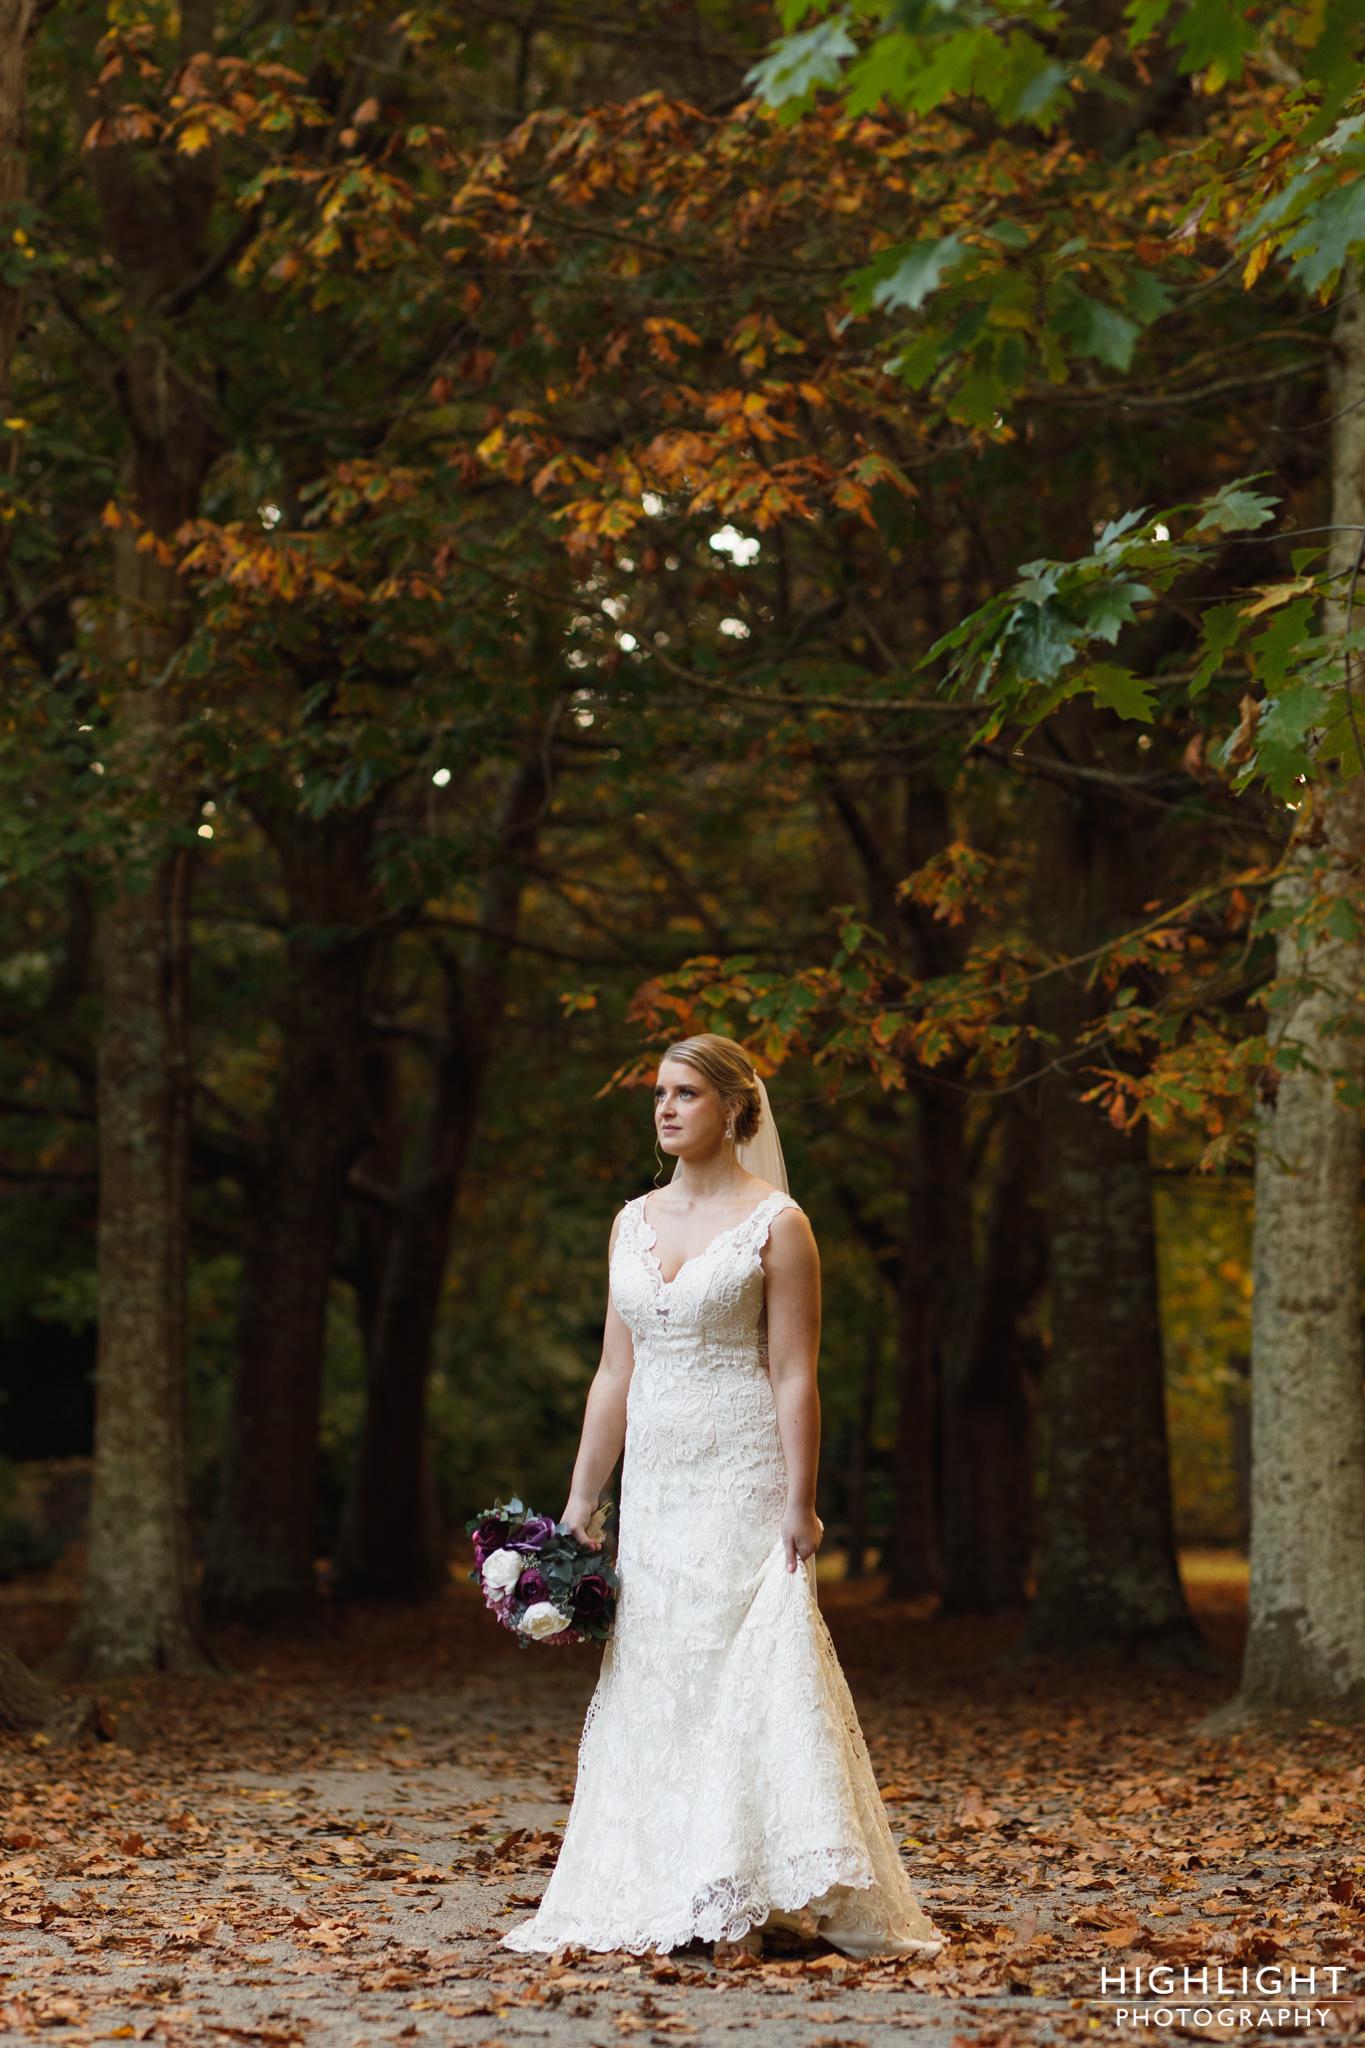 highlight-wedding-photography-feilding-new-zealand-152.jpg